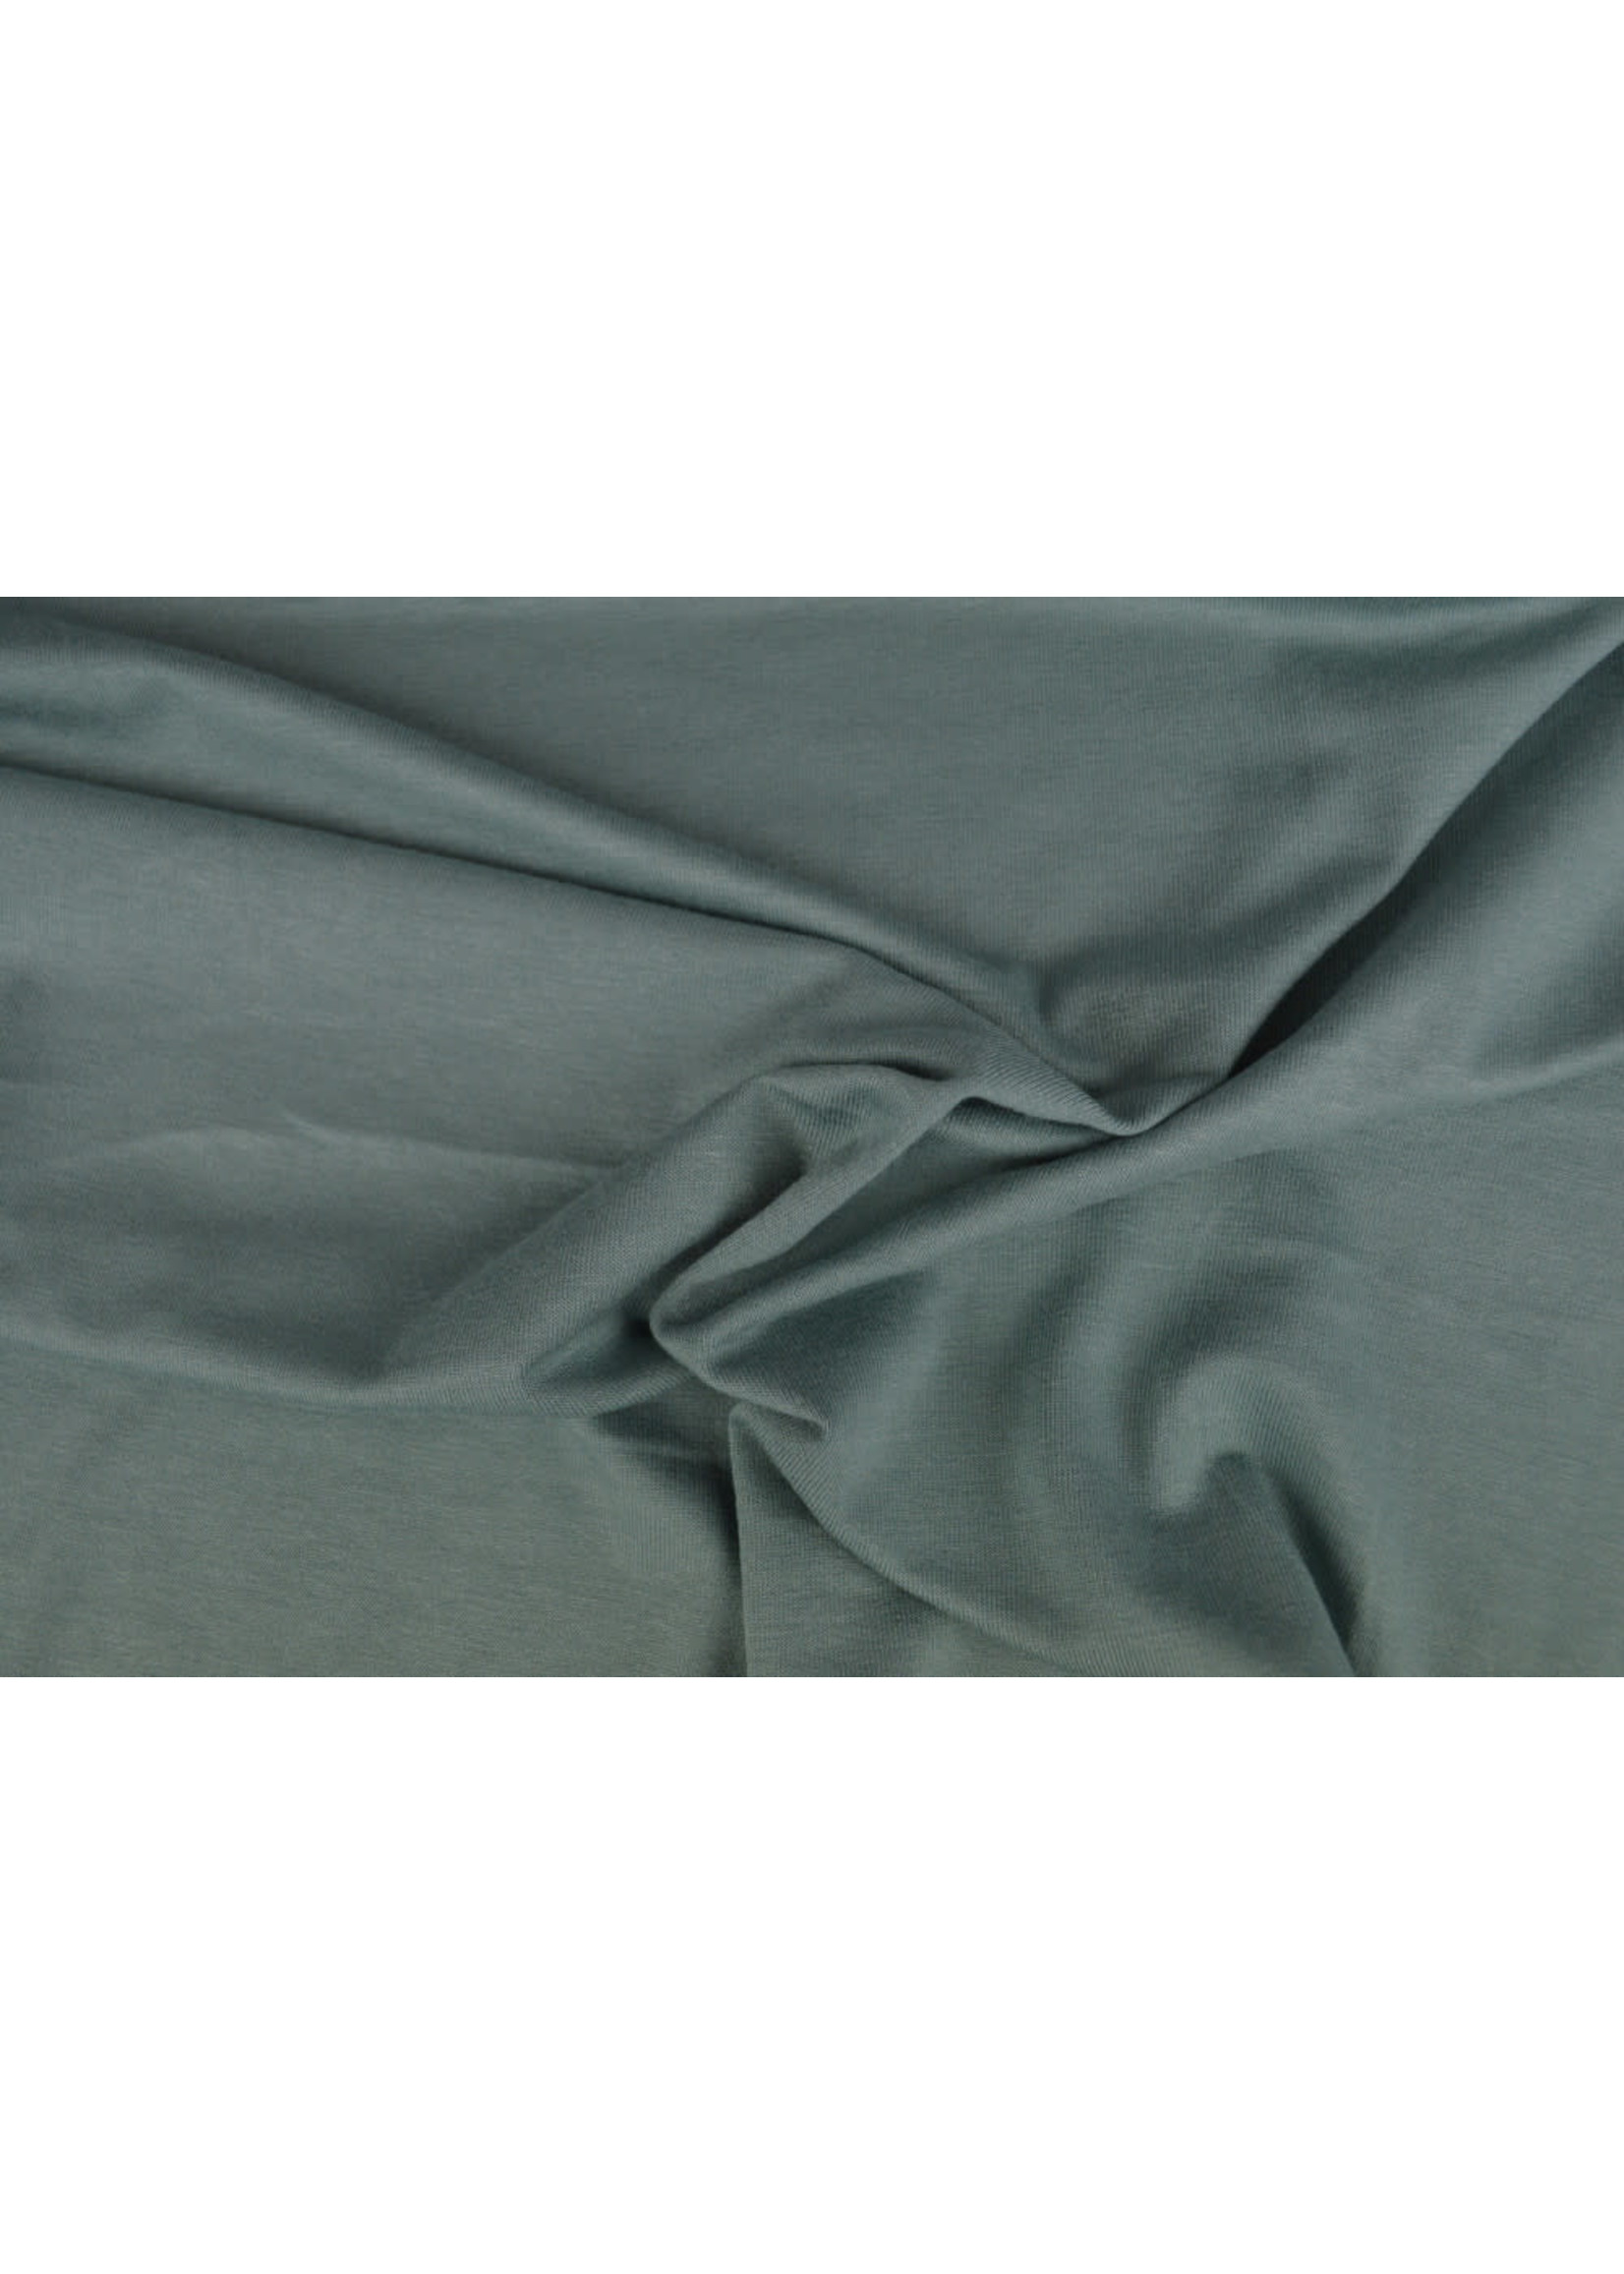 Viscose tricot oud groen